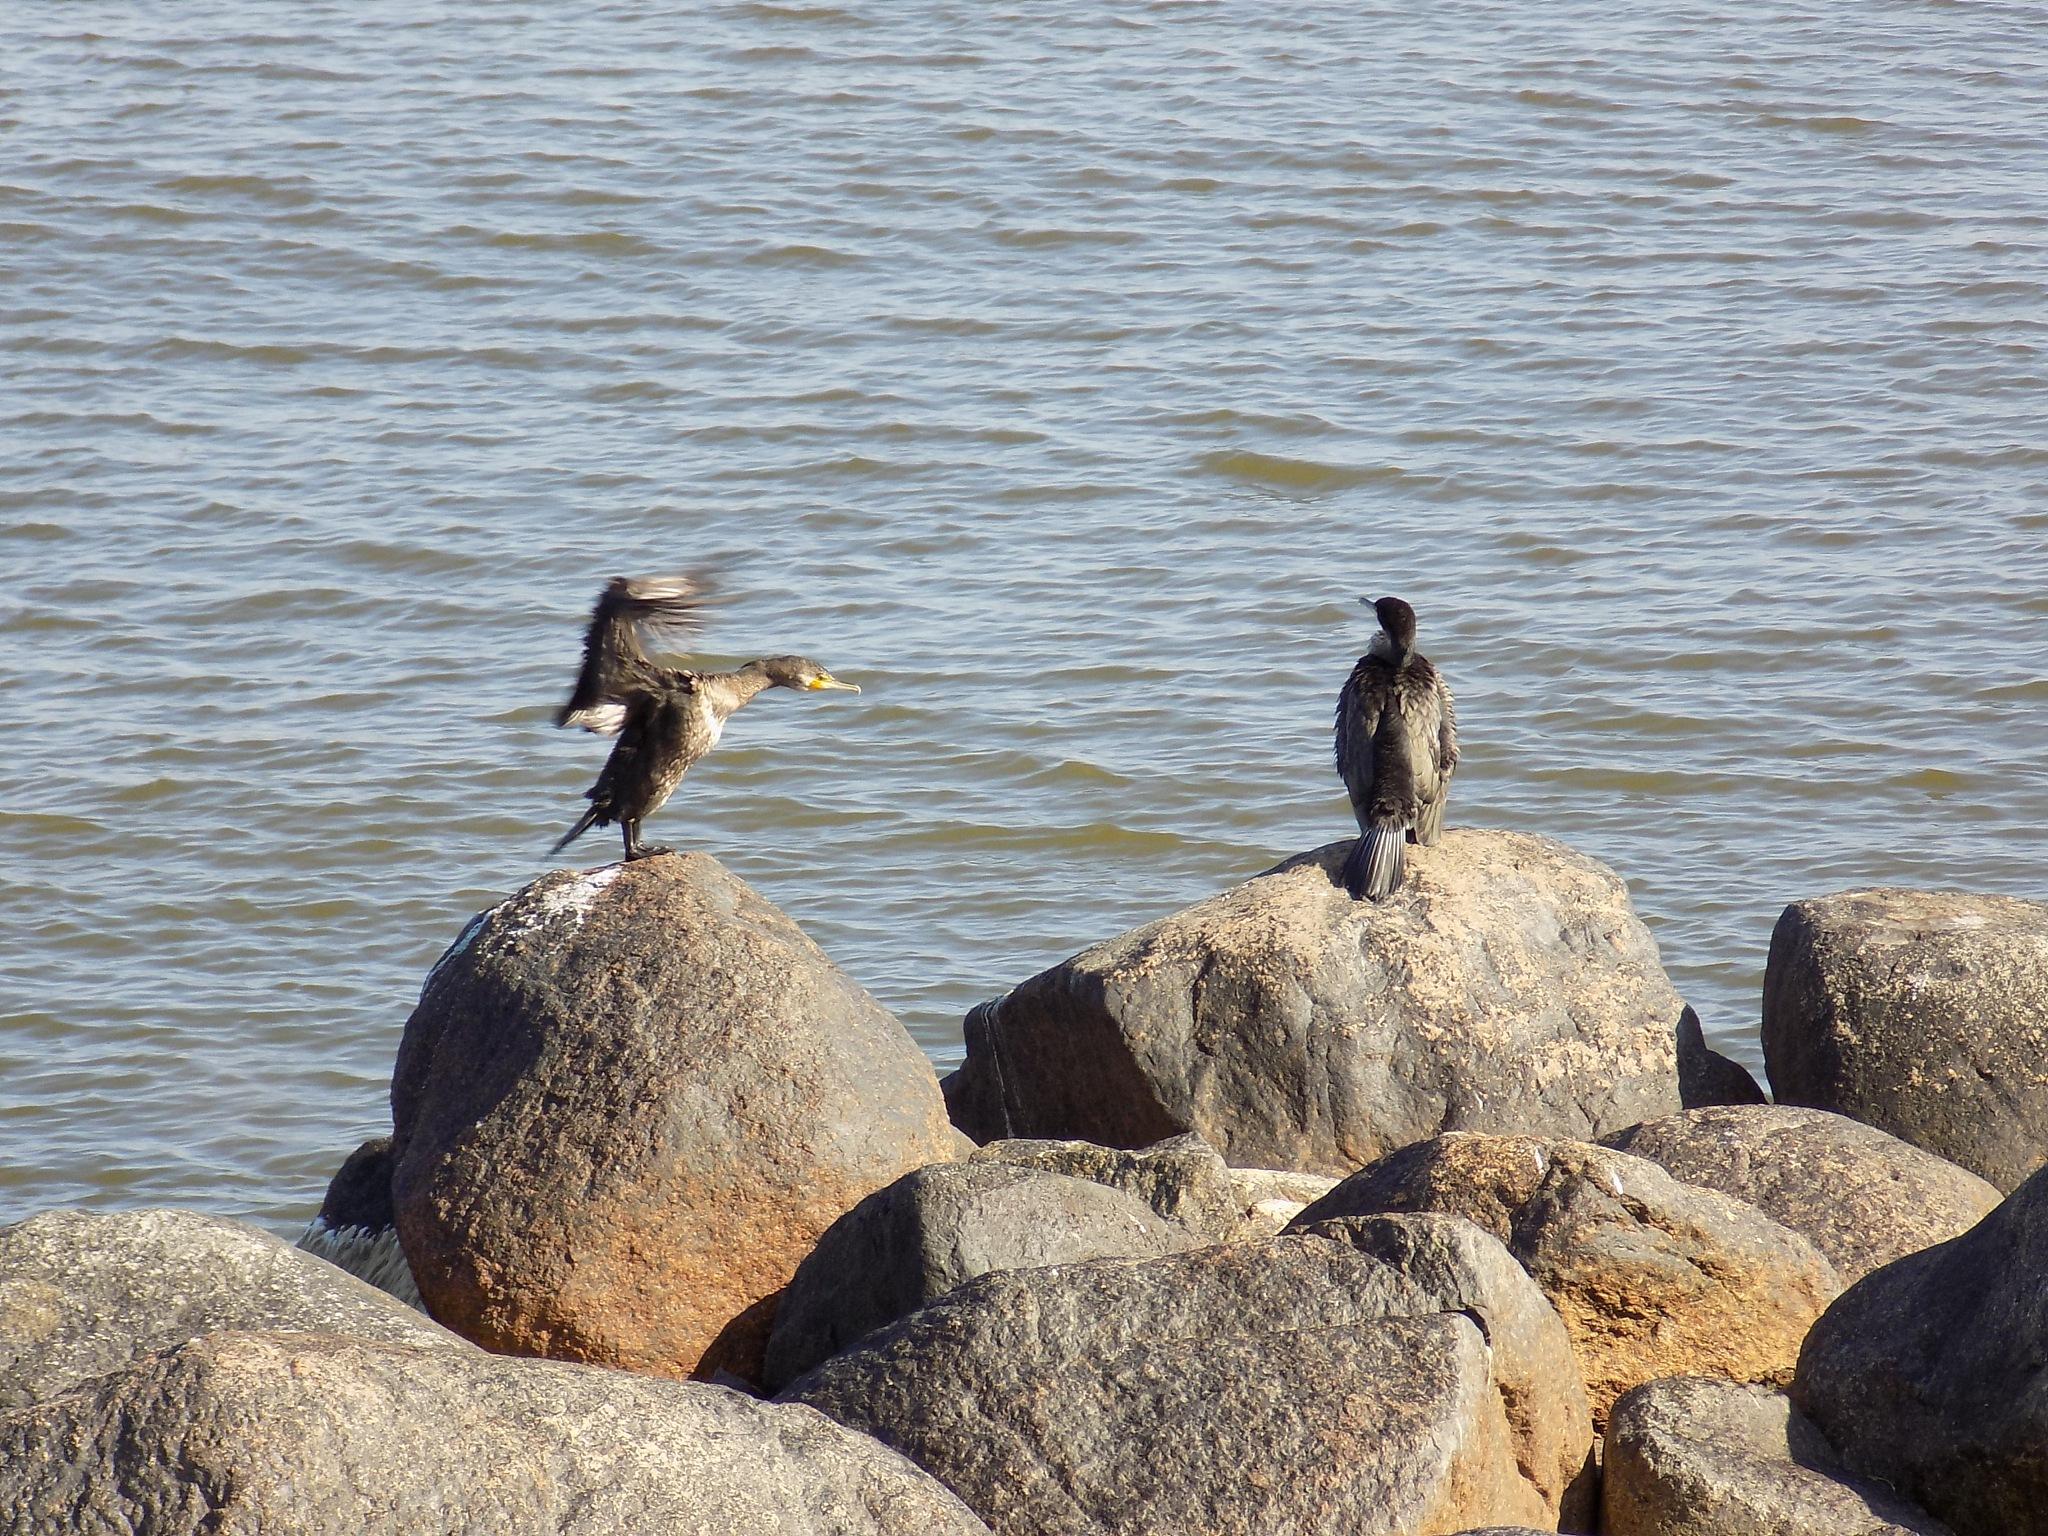 Sea birds by uzkuraitiene62